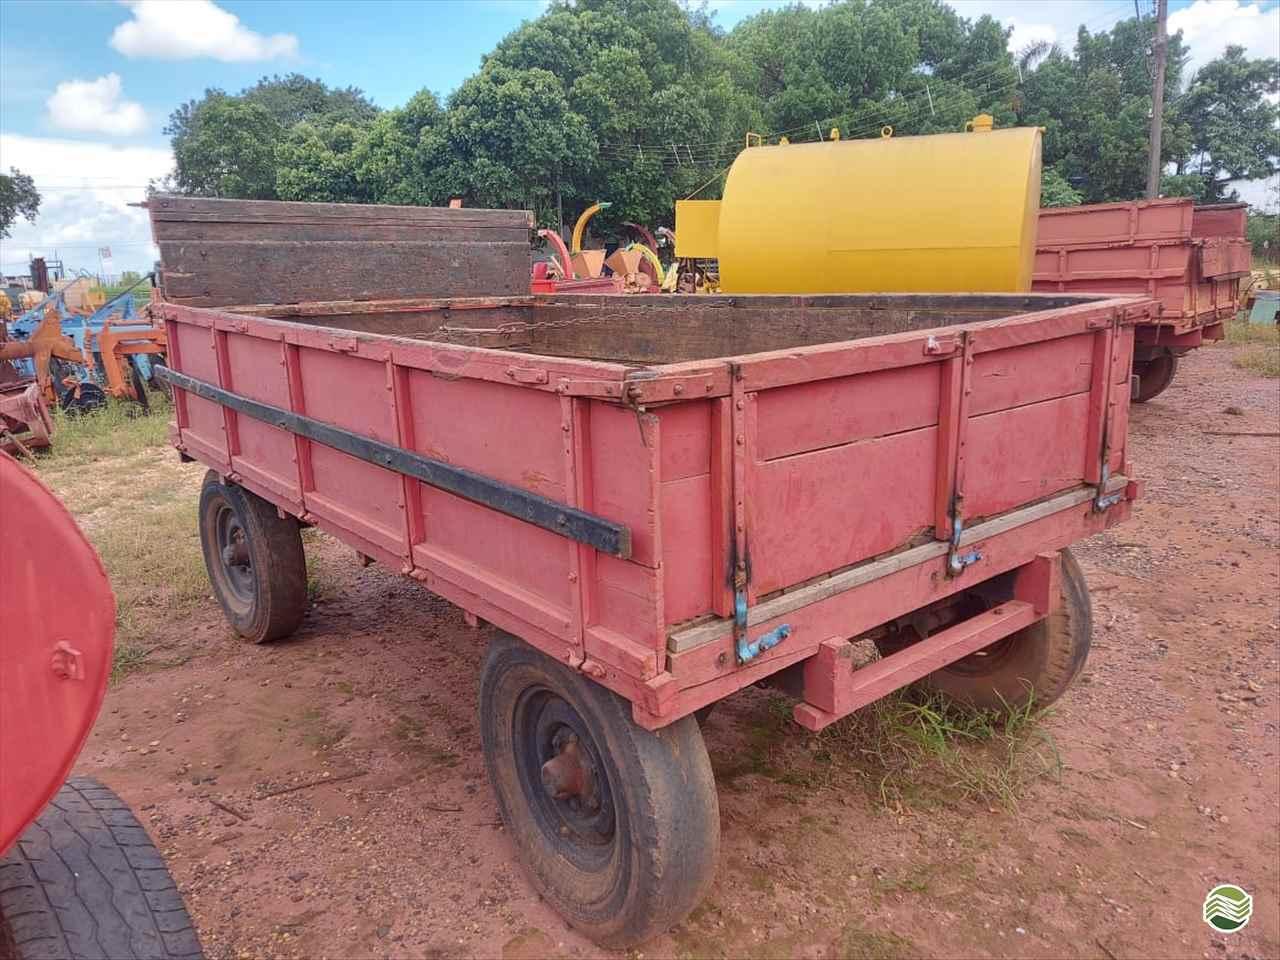 CARRETA AGRÍCOLA CARRETA CARROCERIA  20 Terra Santa Implementos Agrícolas